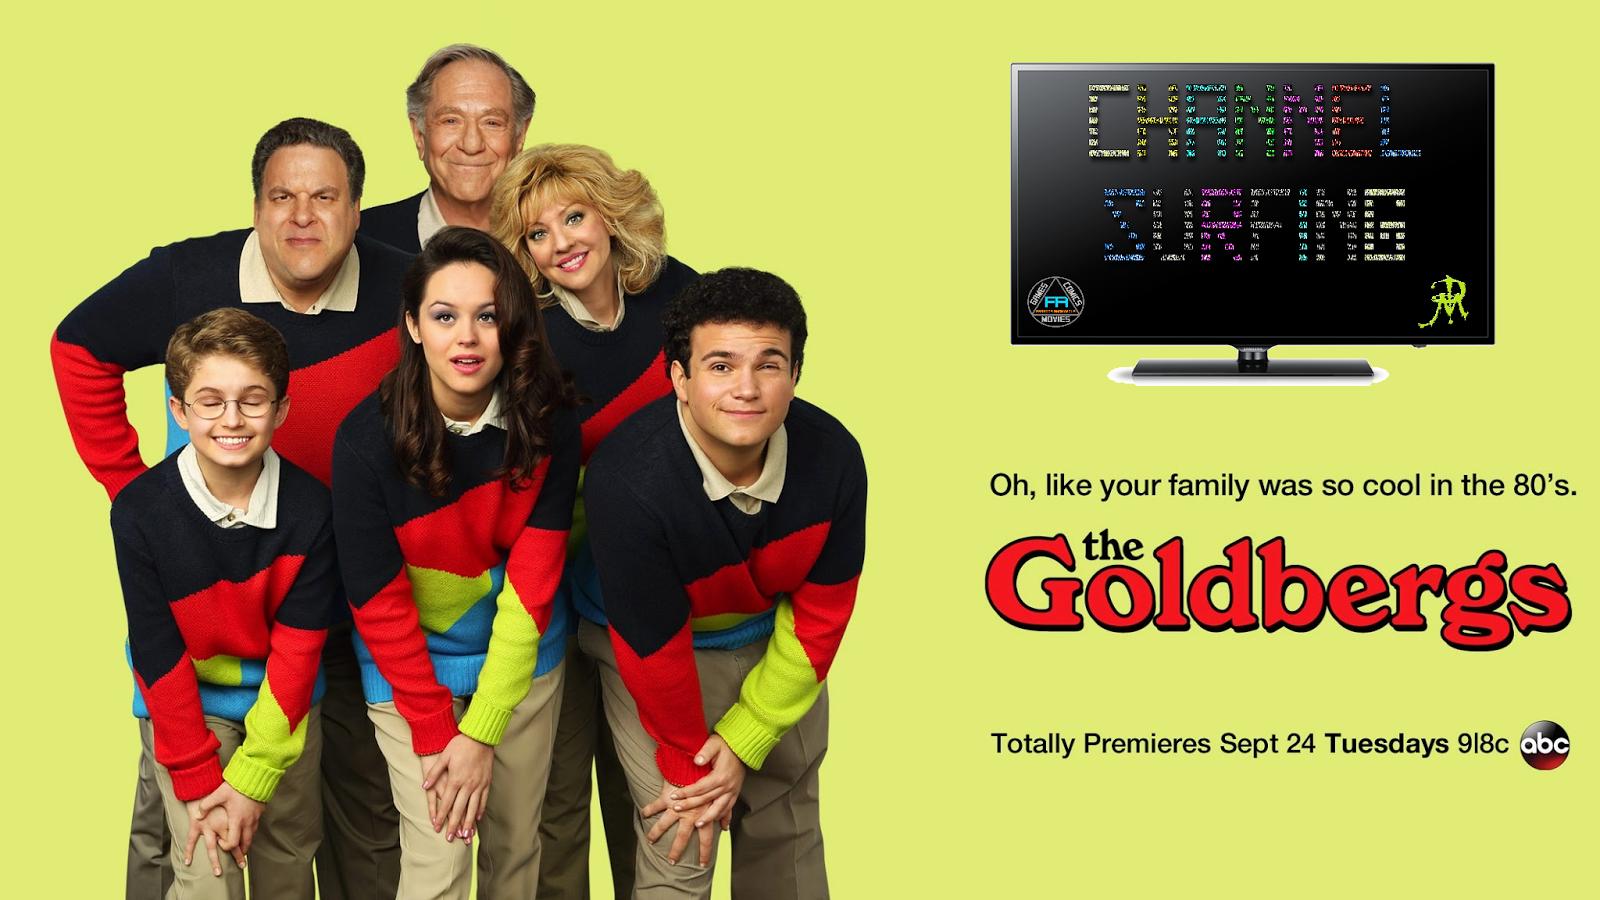 The Goldbergs Season Two News and Rumors